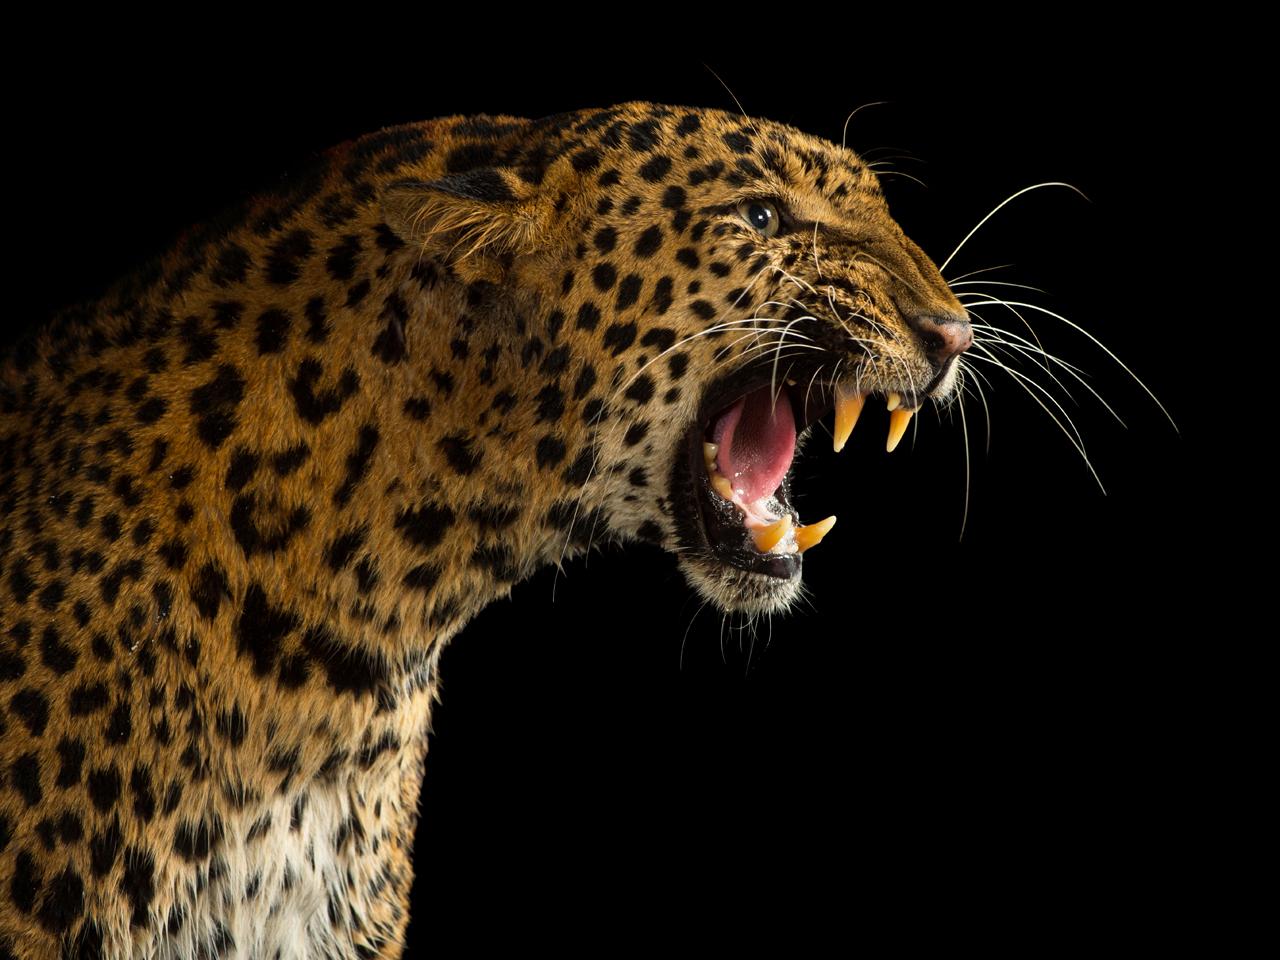 india leopards kill children